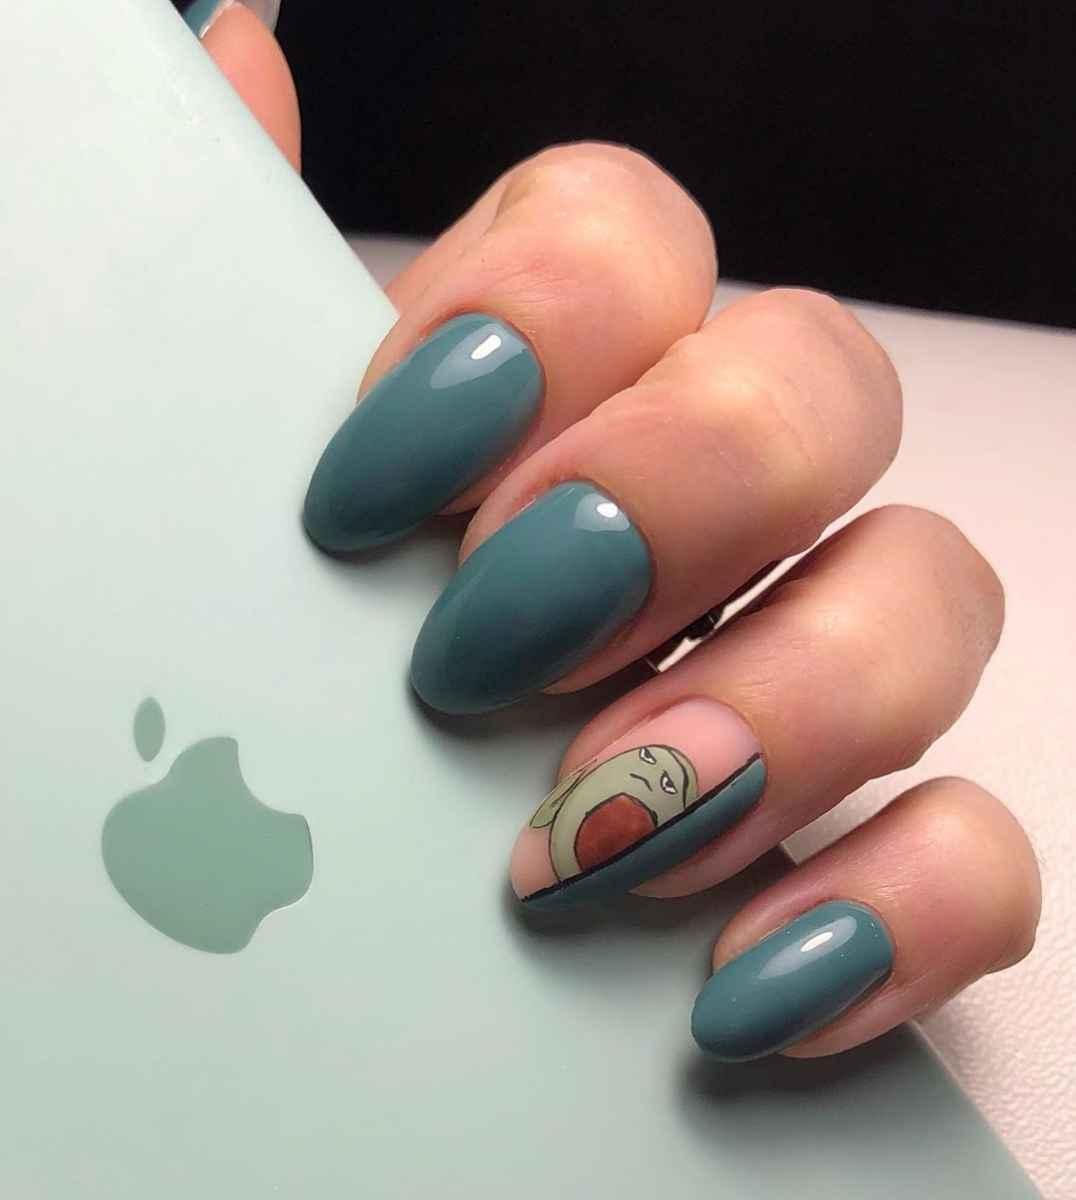 Маникюр с авокадо на одном пальце фото_5